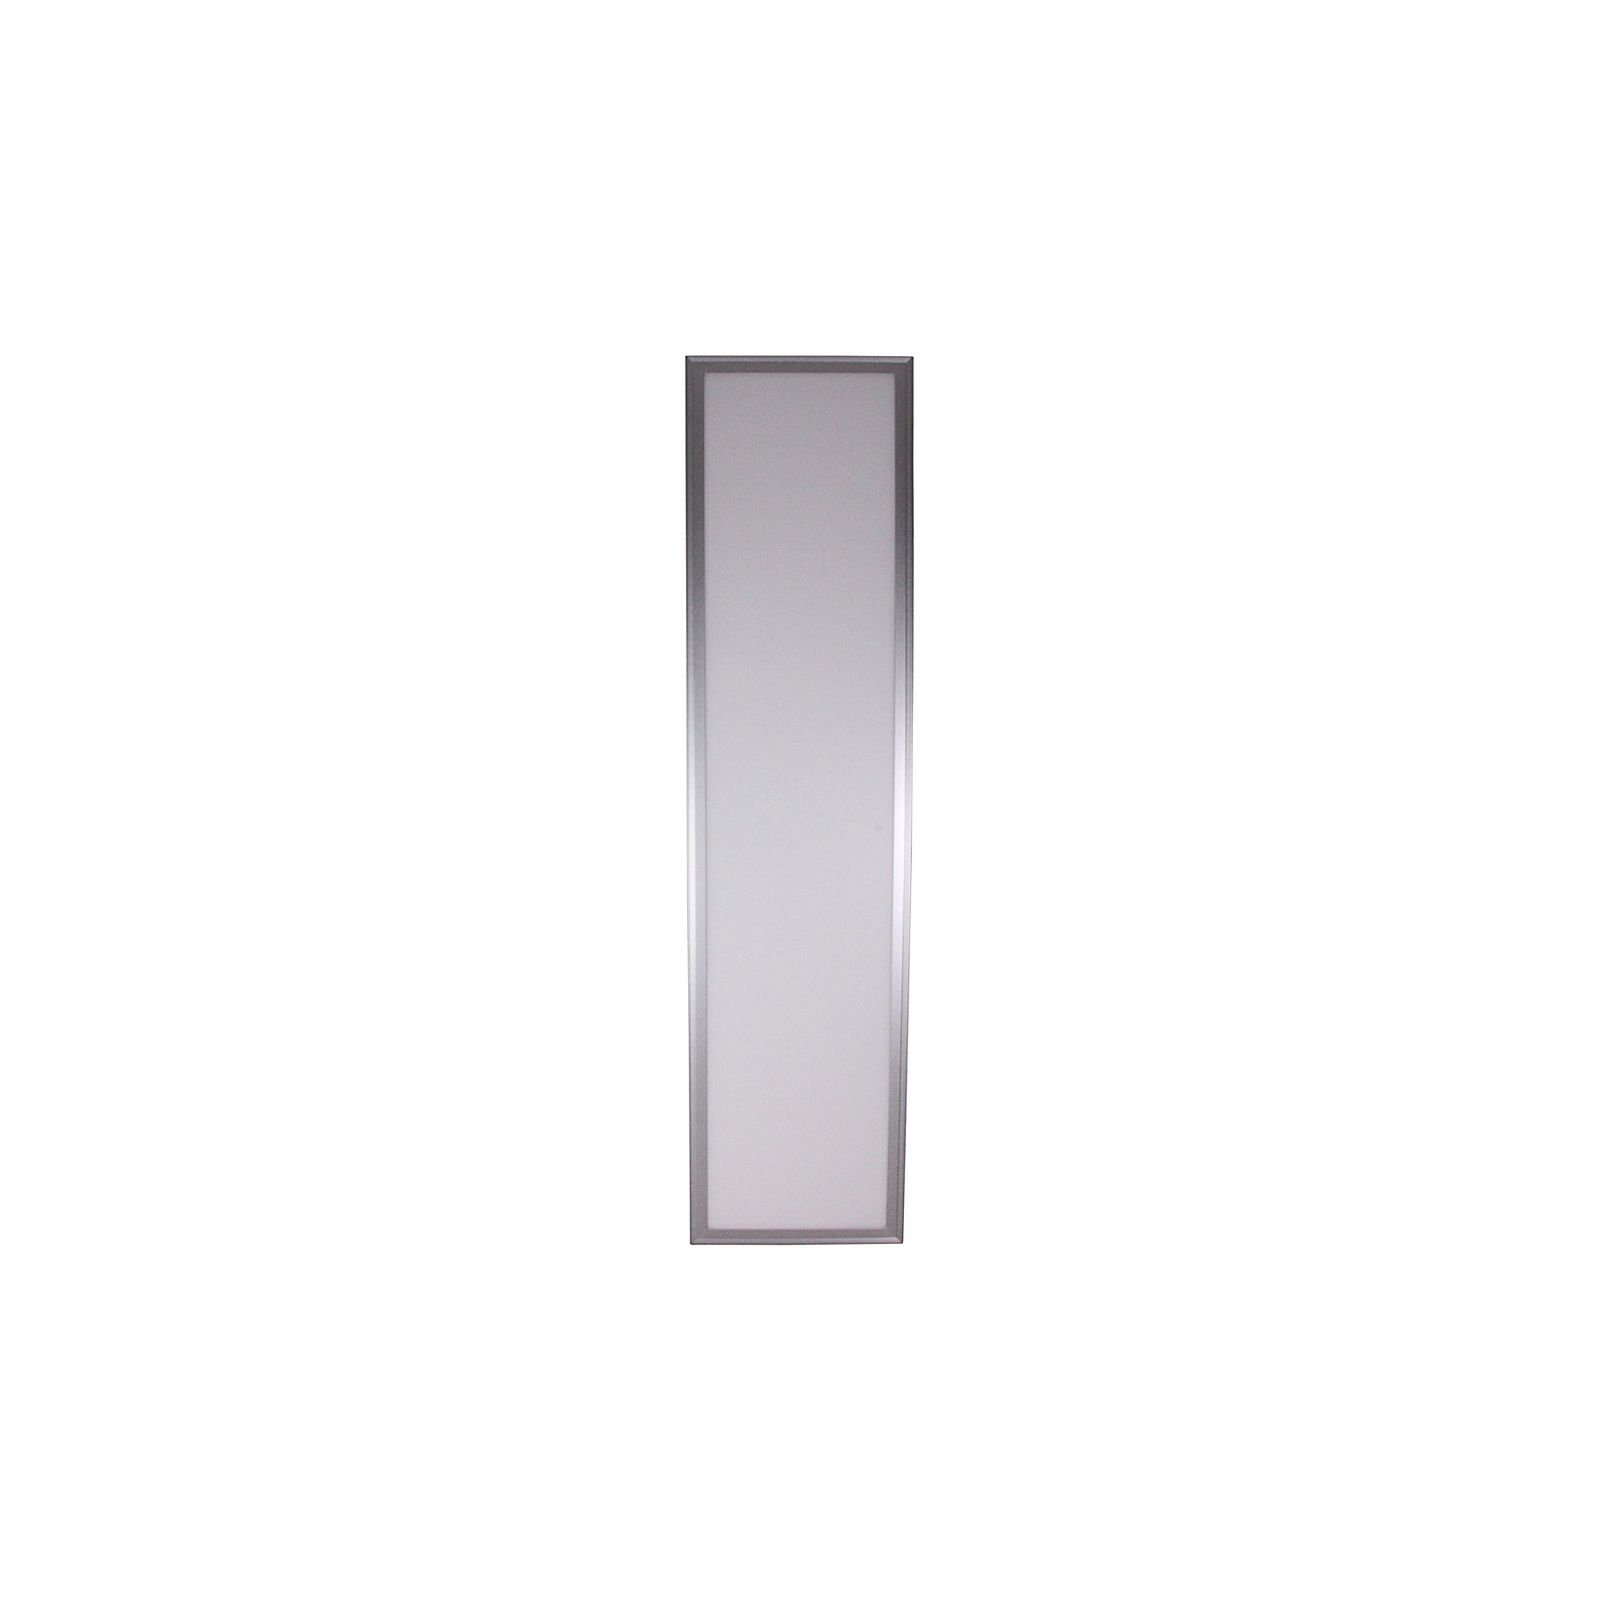 Patona LED panel 300x1200x9 36W 3300lm 4000 - 4500K natur white AC 200-240V dimmable 30x120x0,9cm